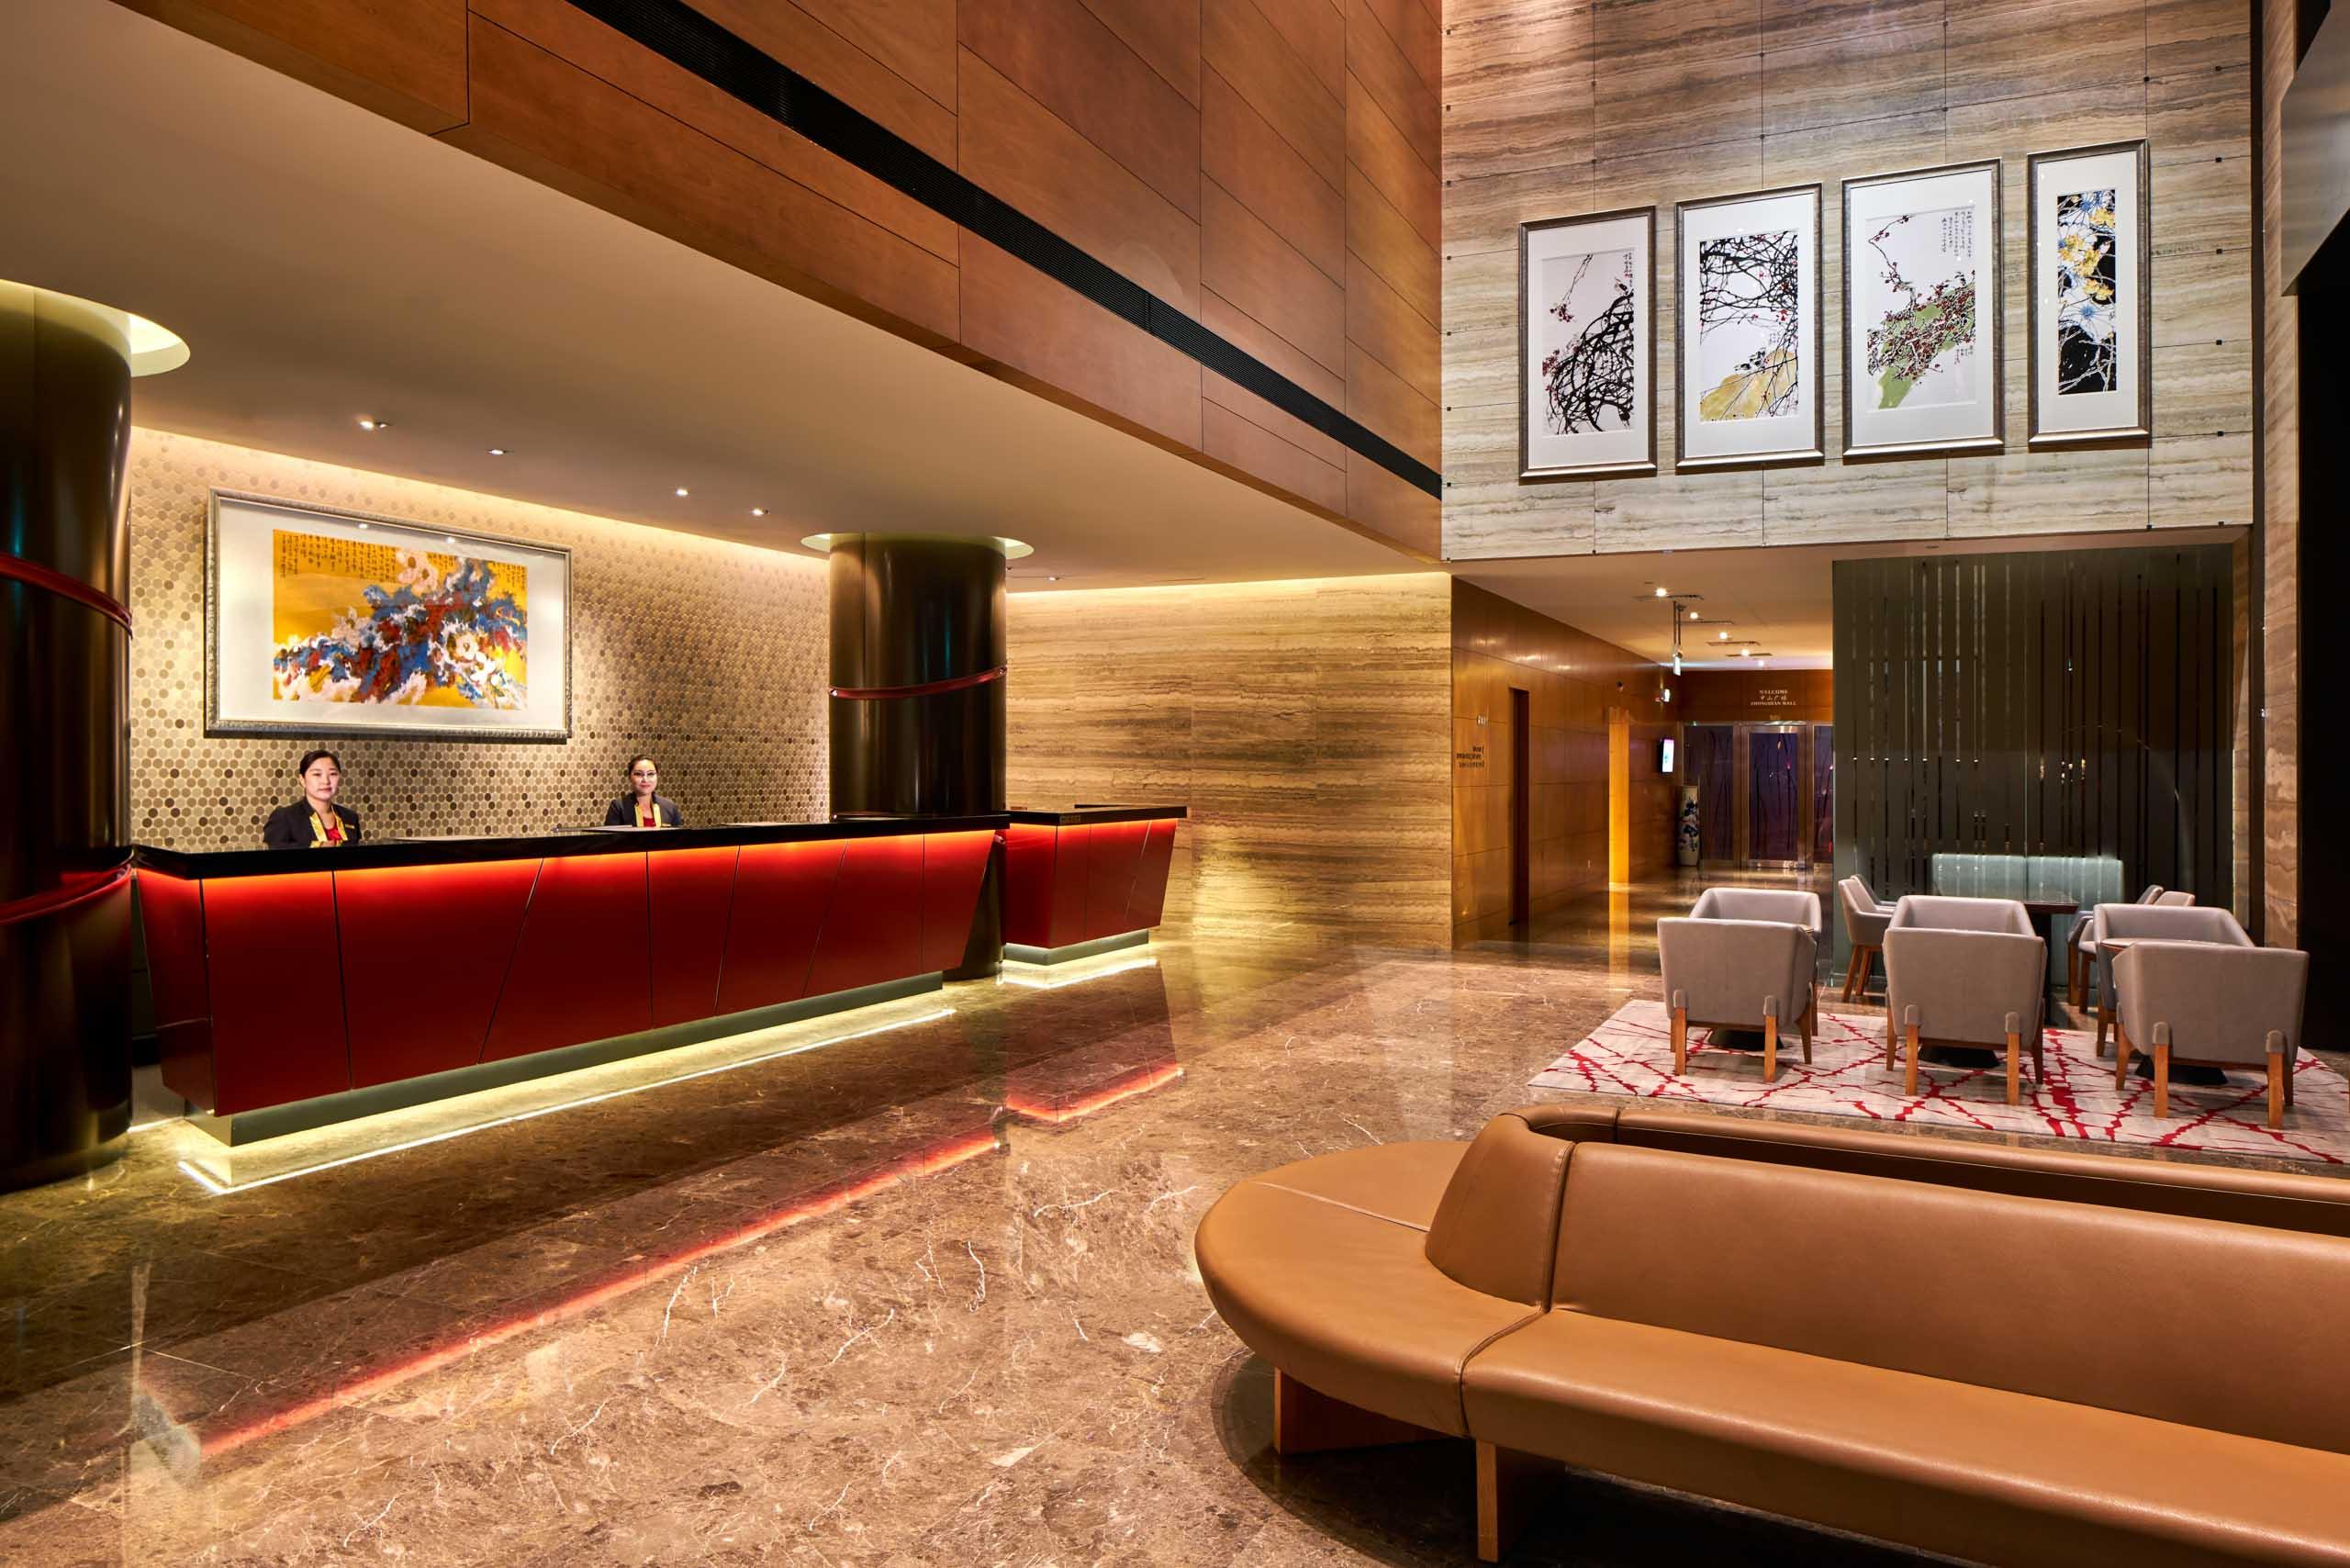 Ramada Hotel Main Lobby with staff